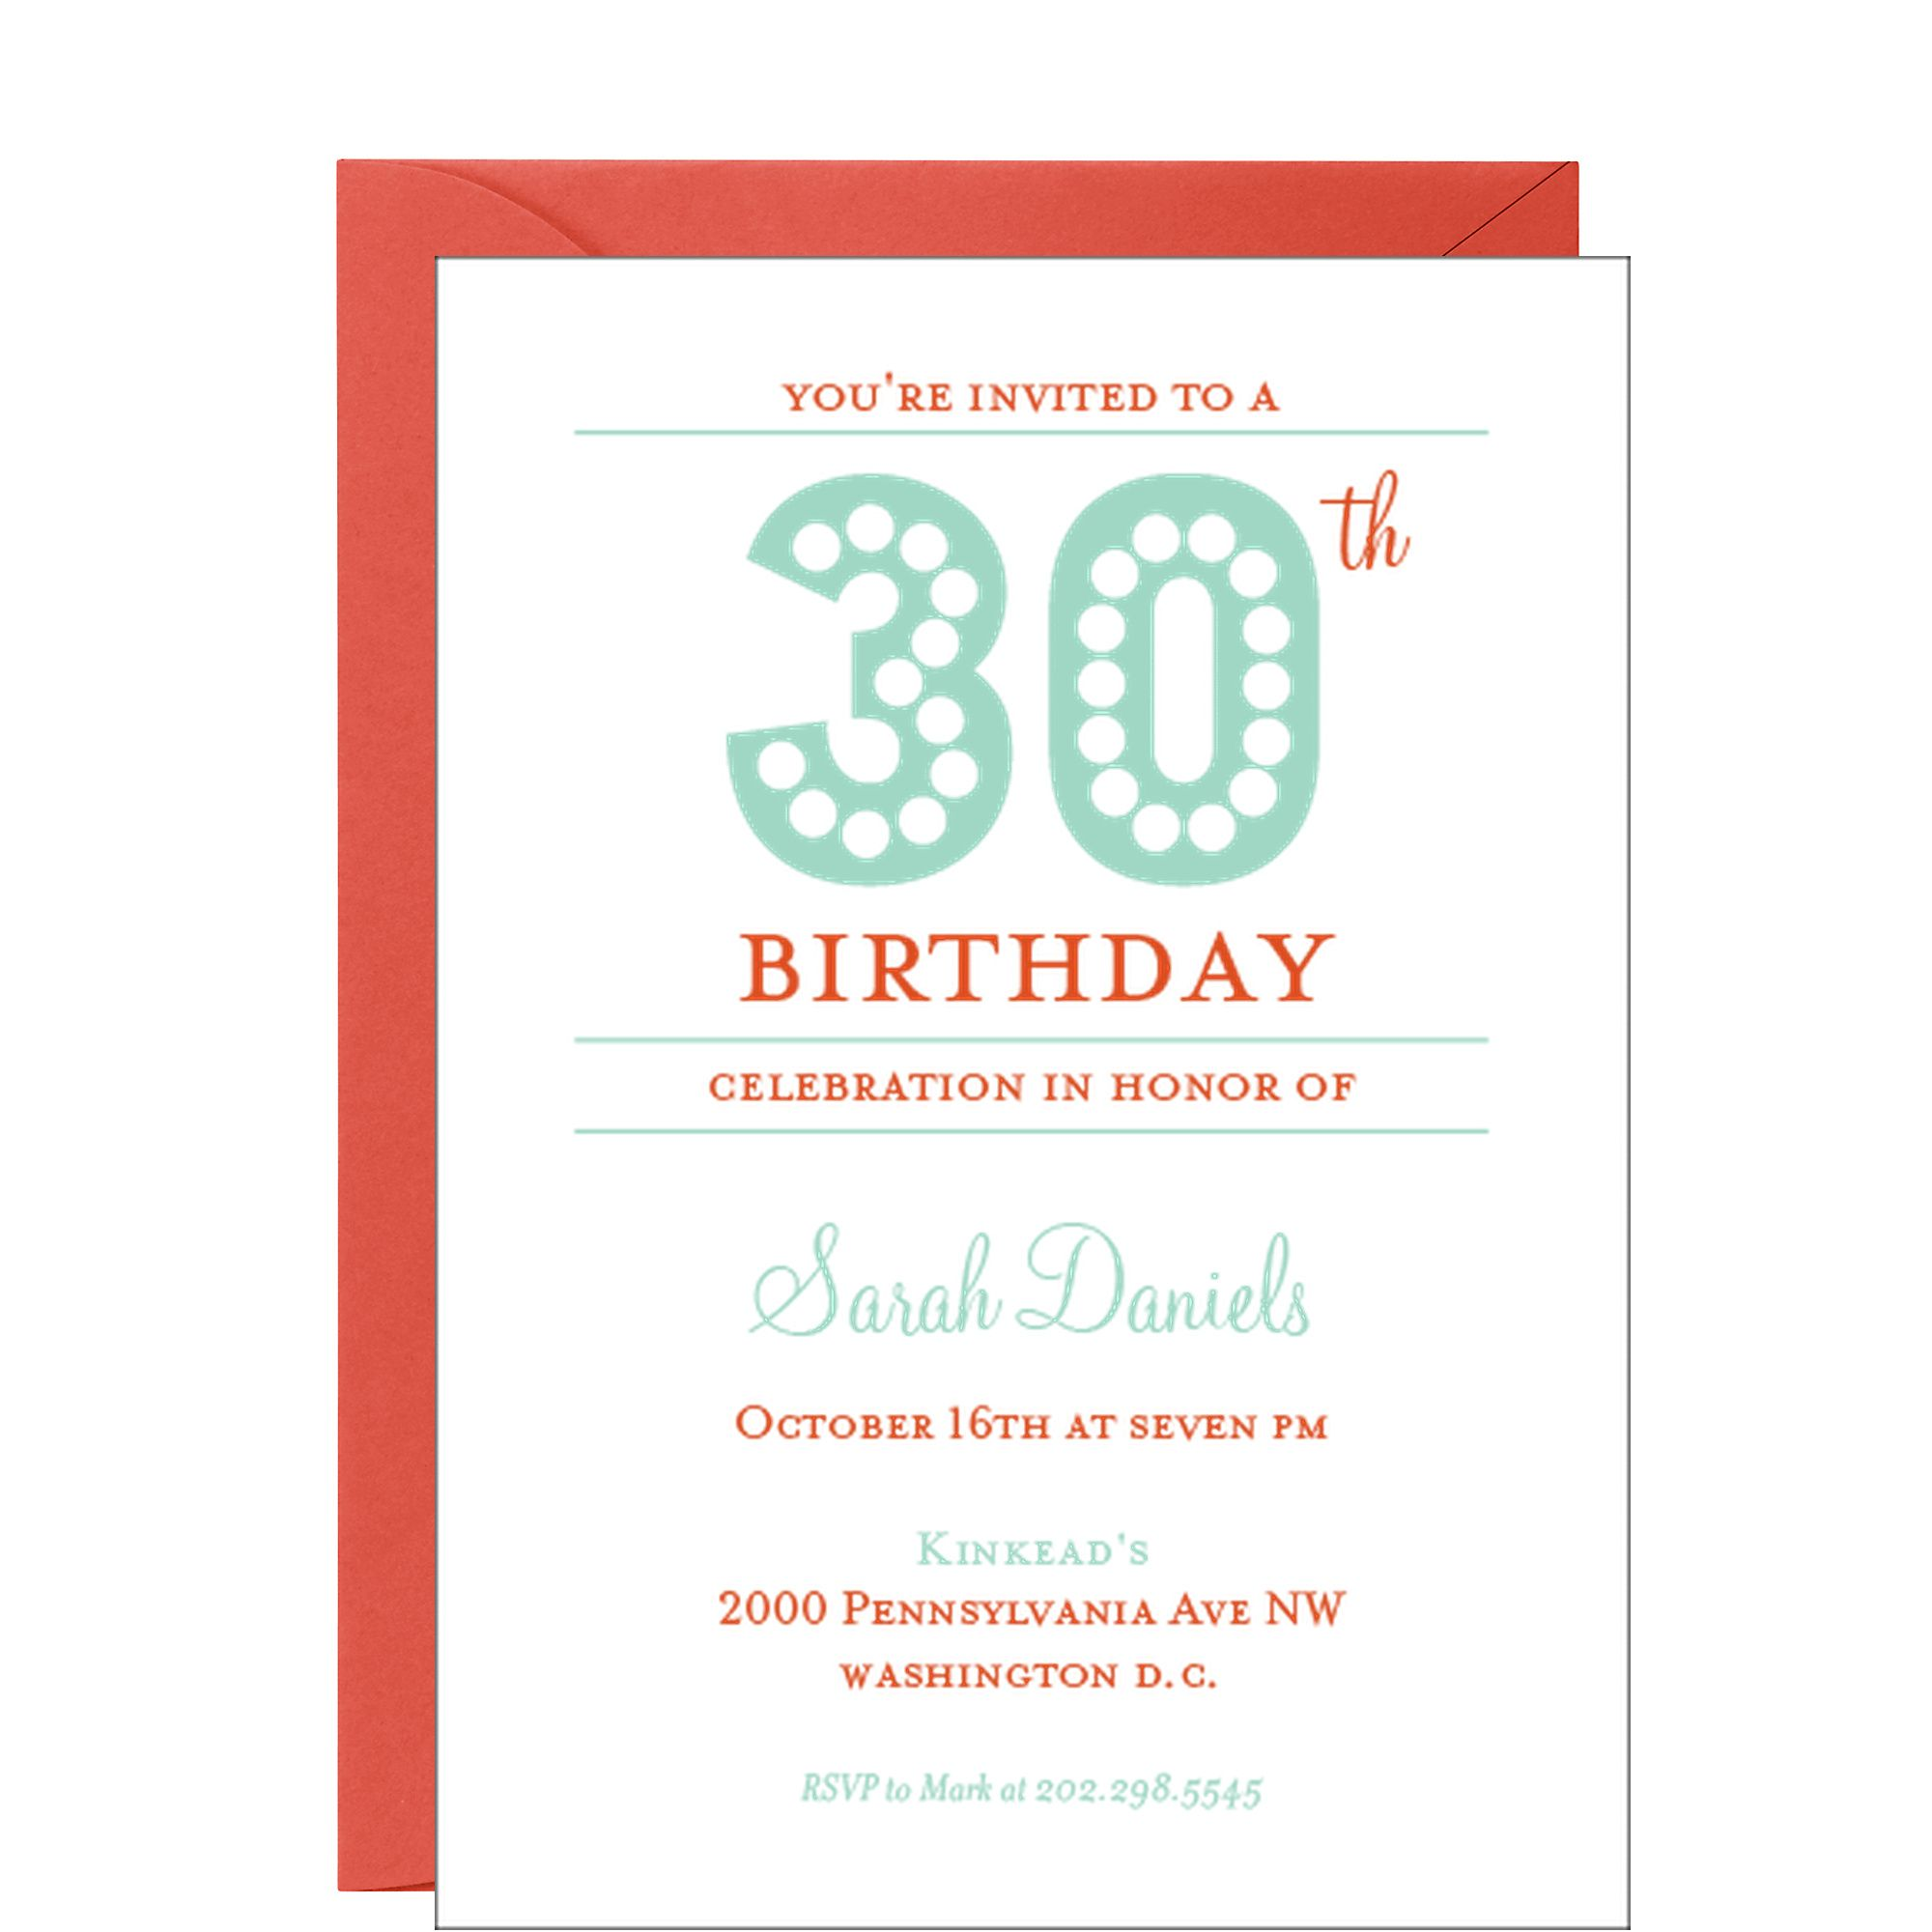 Adult Birthday Lights Party Invitation | RETRO FUN! | Pinterest ...